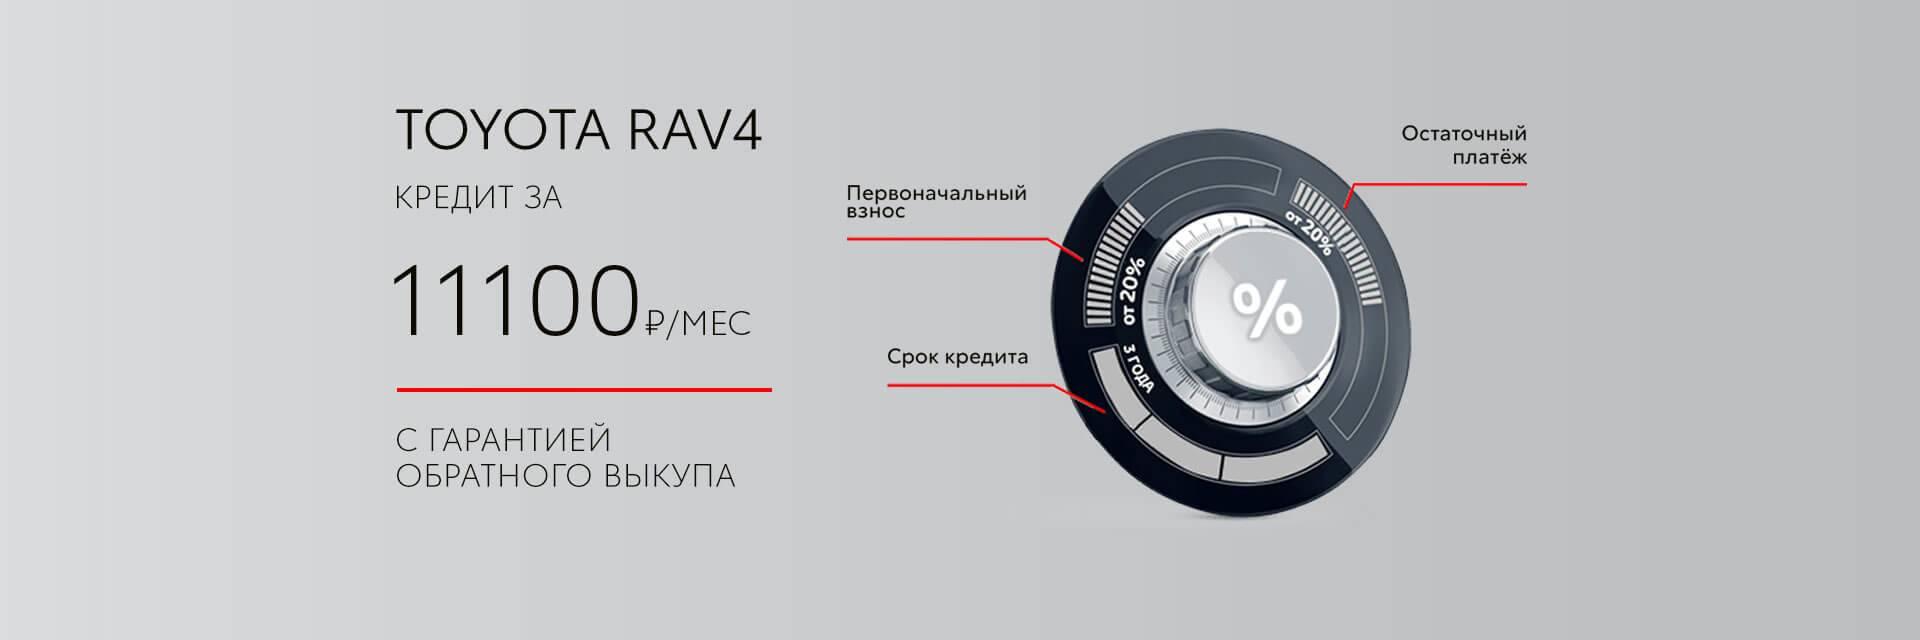 RAV4 кредит